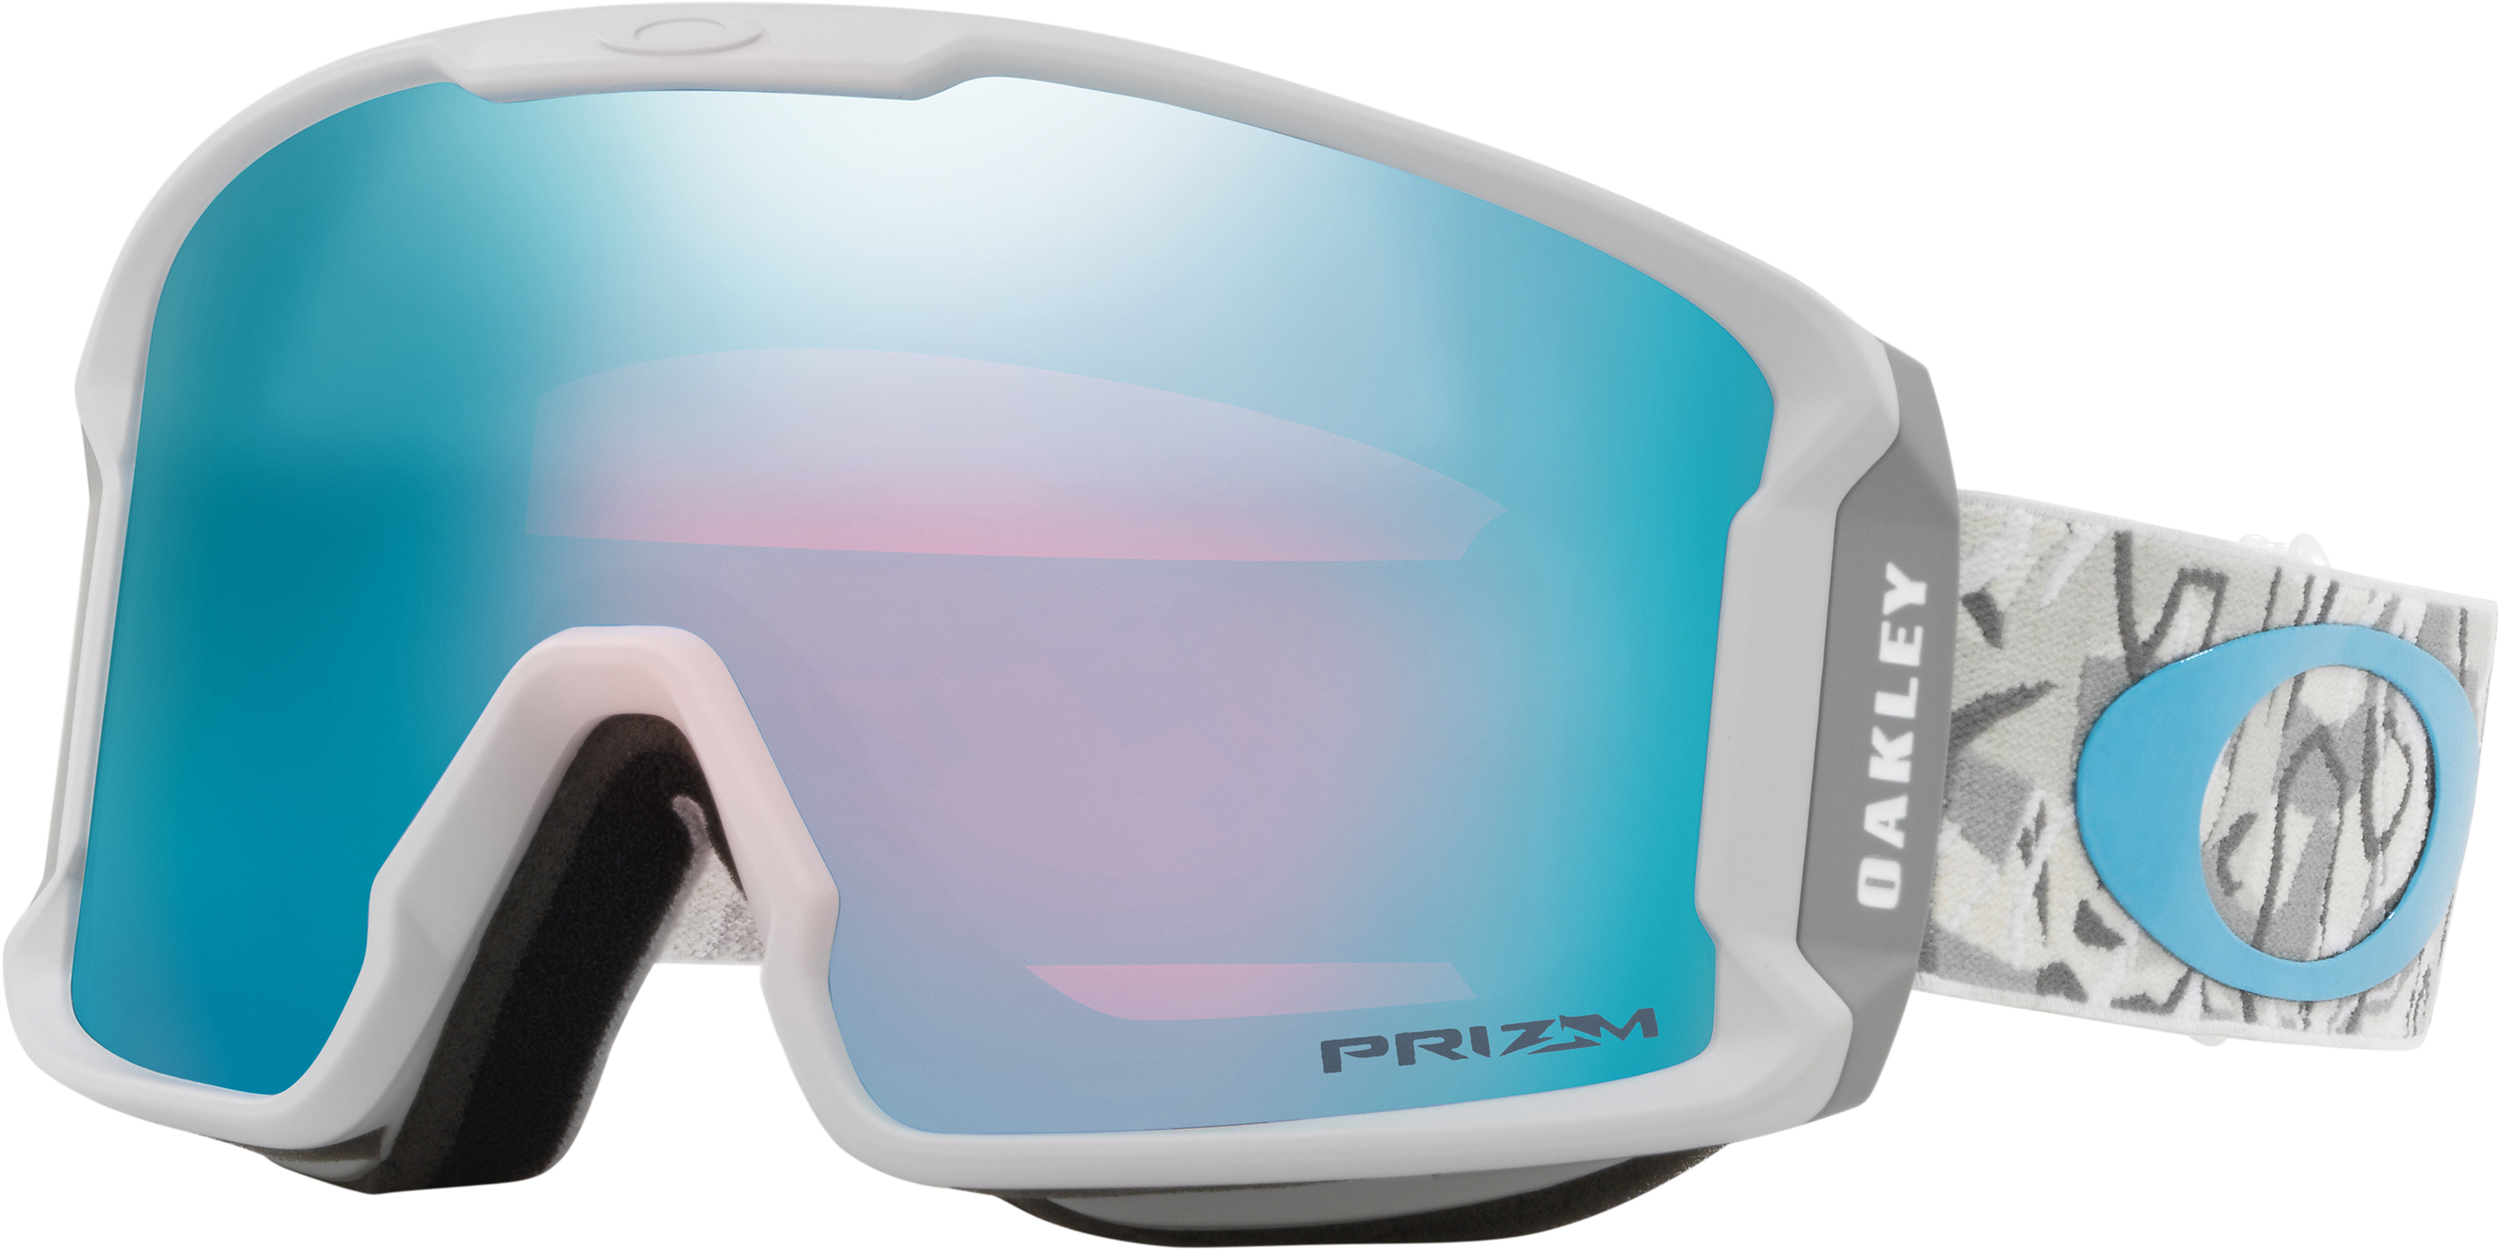 9fcfa060017 Ski and snowboard goggles